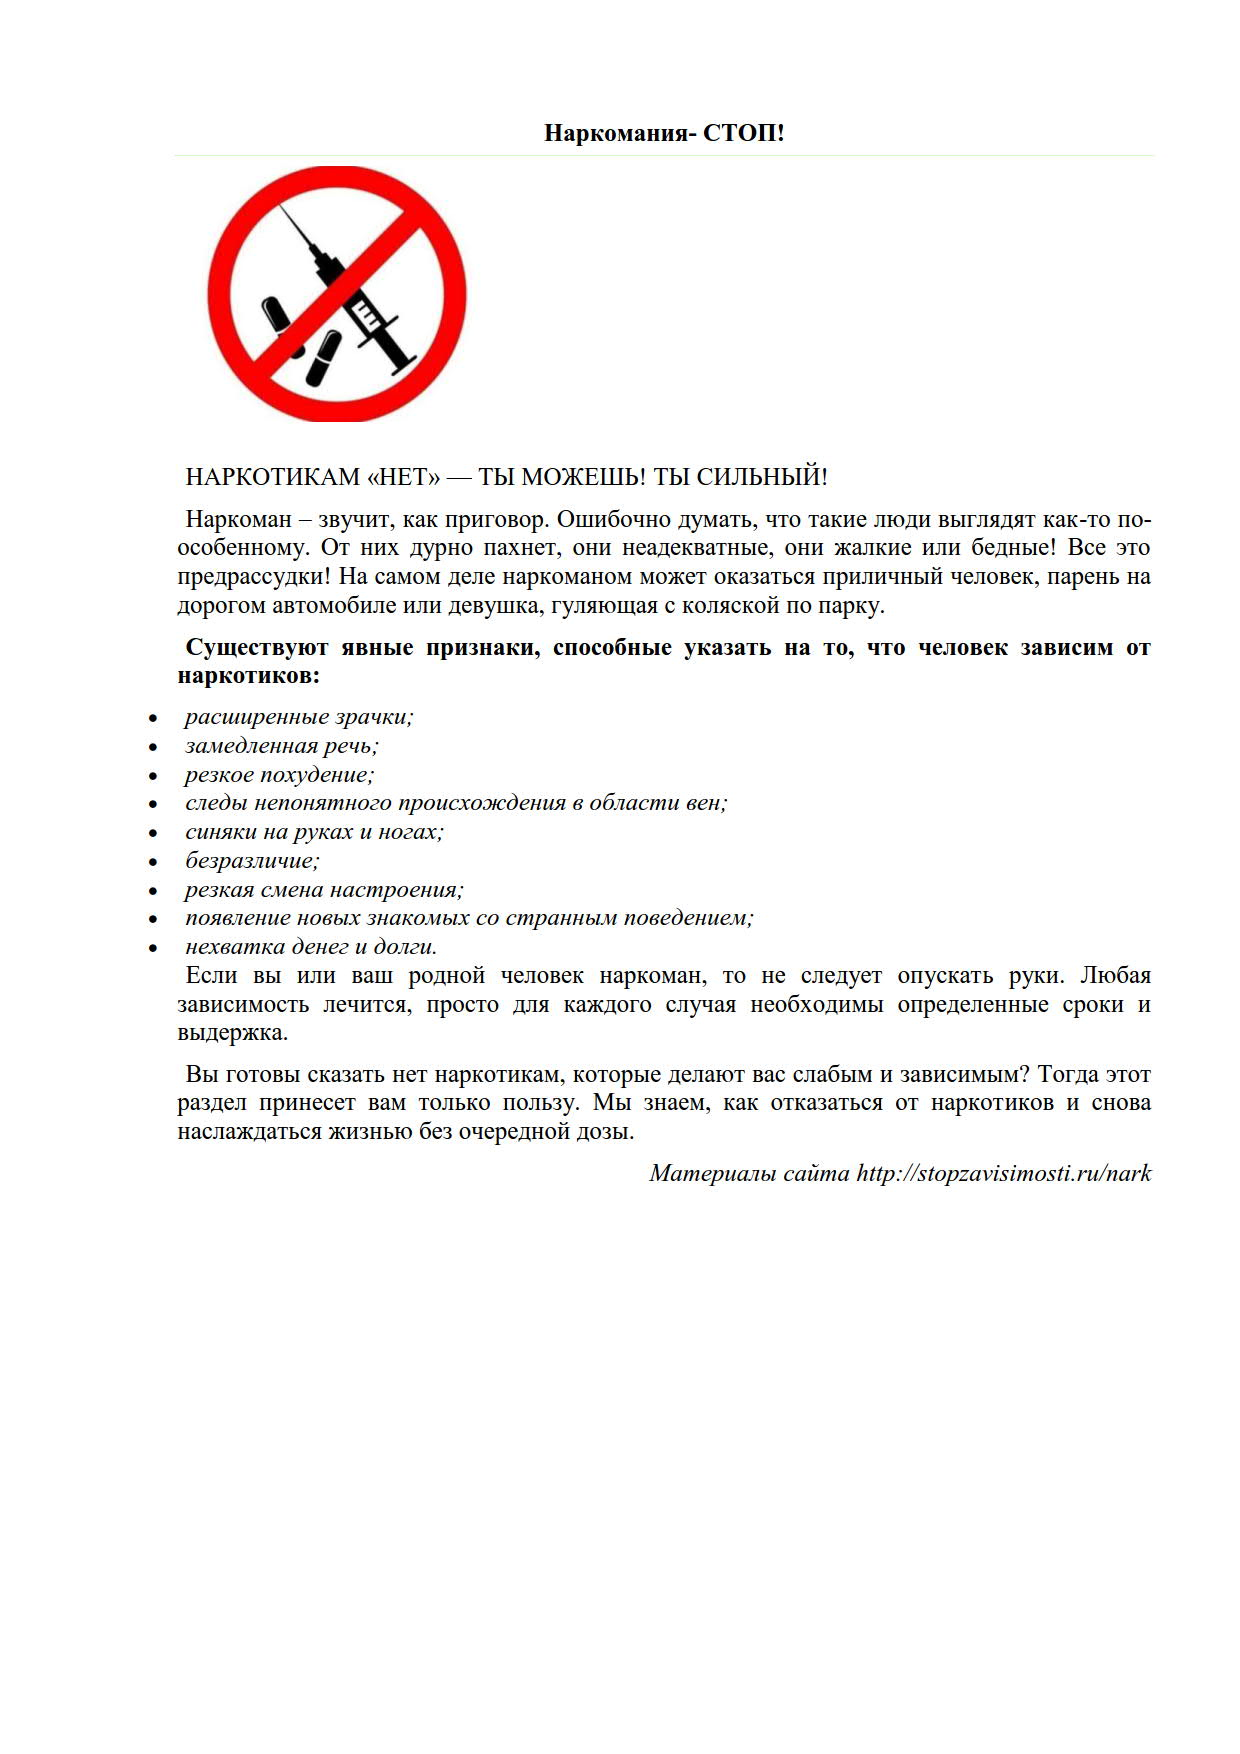 2. Наркомания-СТОП_1